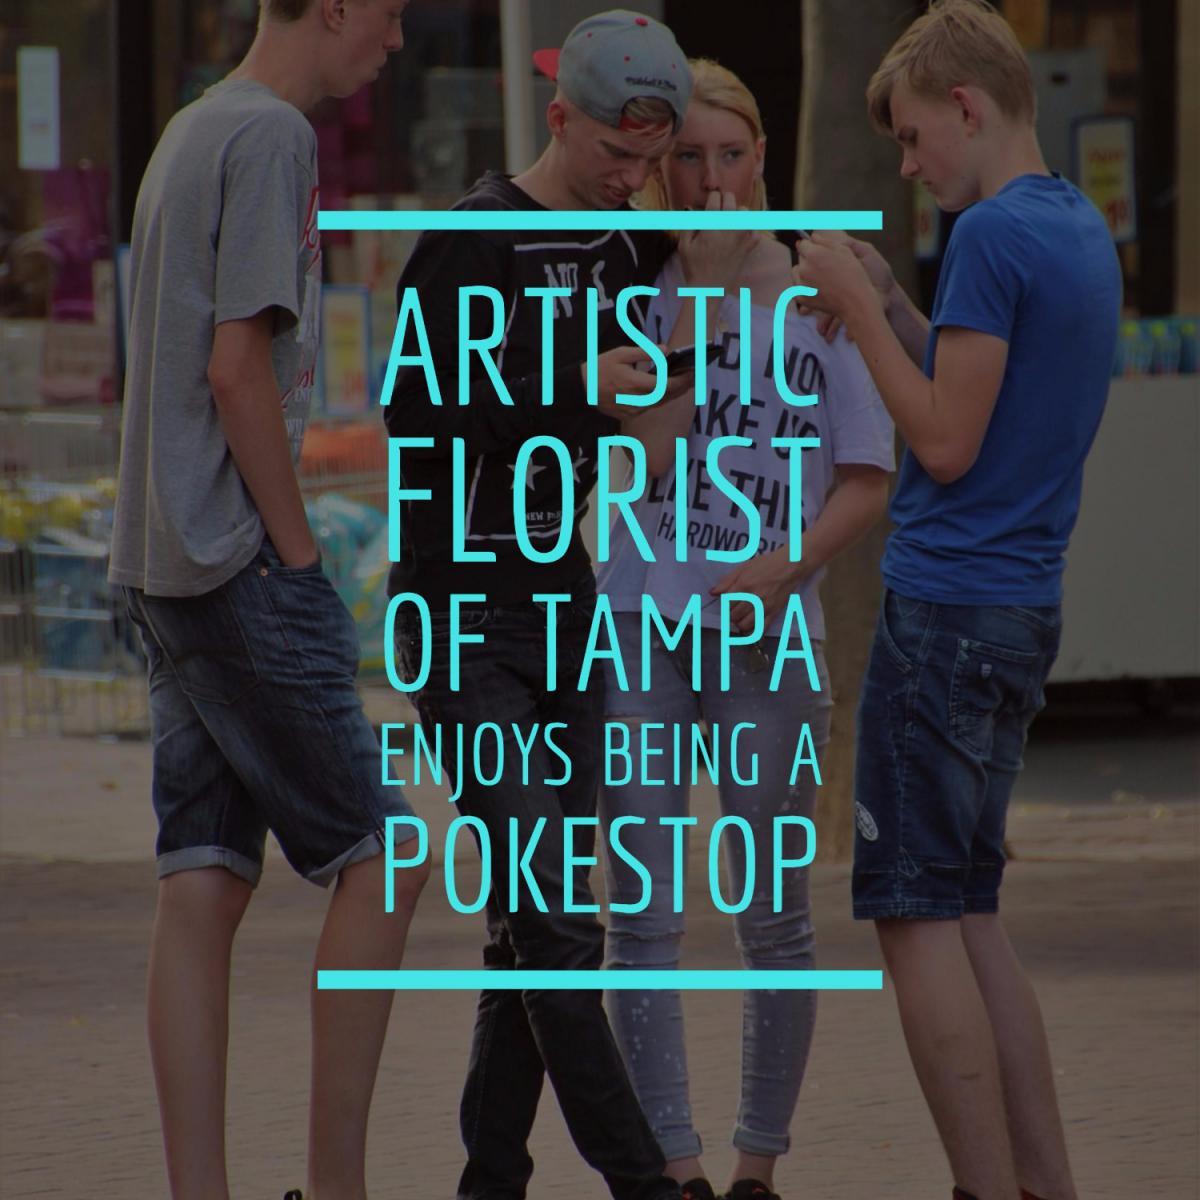 Artistic Florist of Tampa Enjoys Being a Pokestop